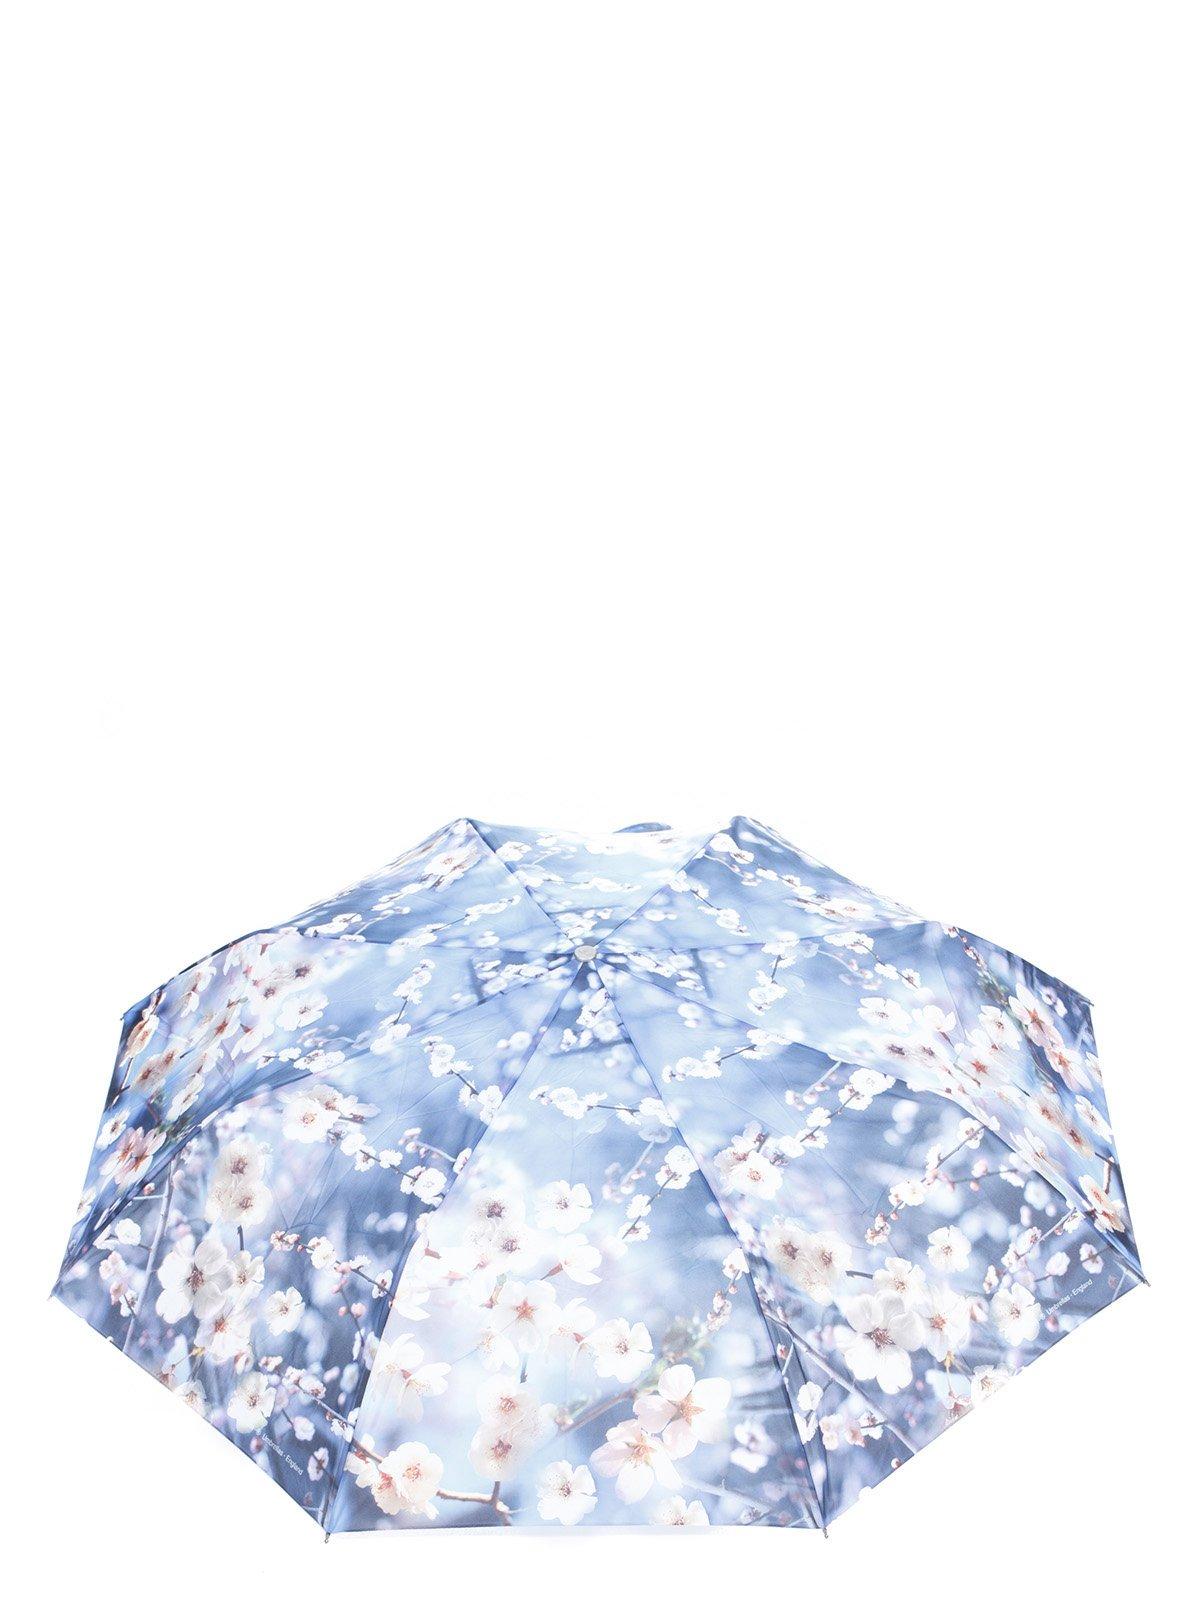 Зонт-полуавтомат | 1019540